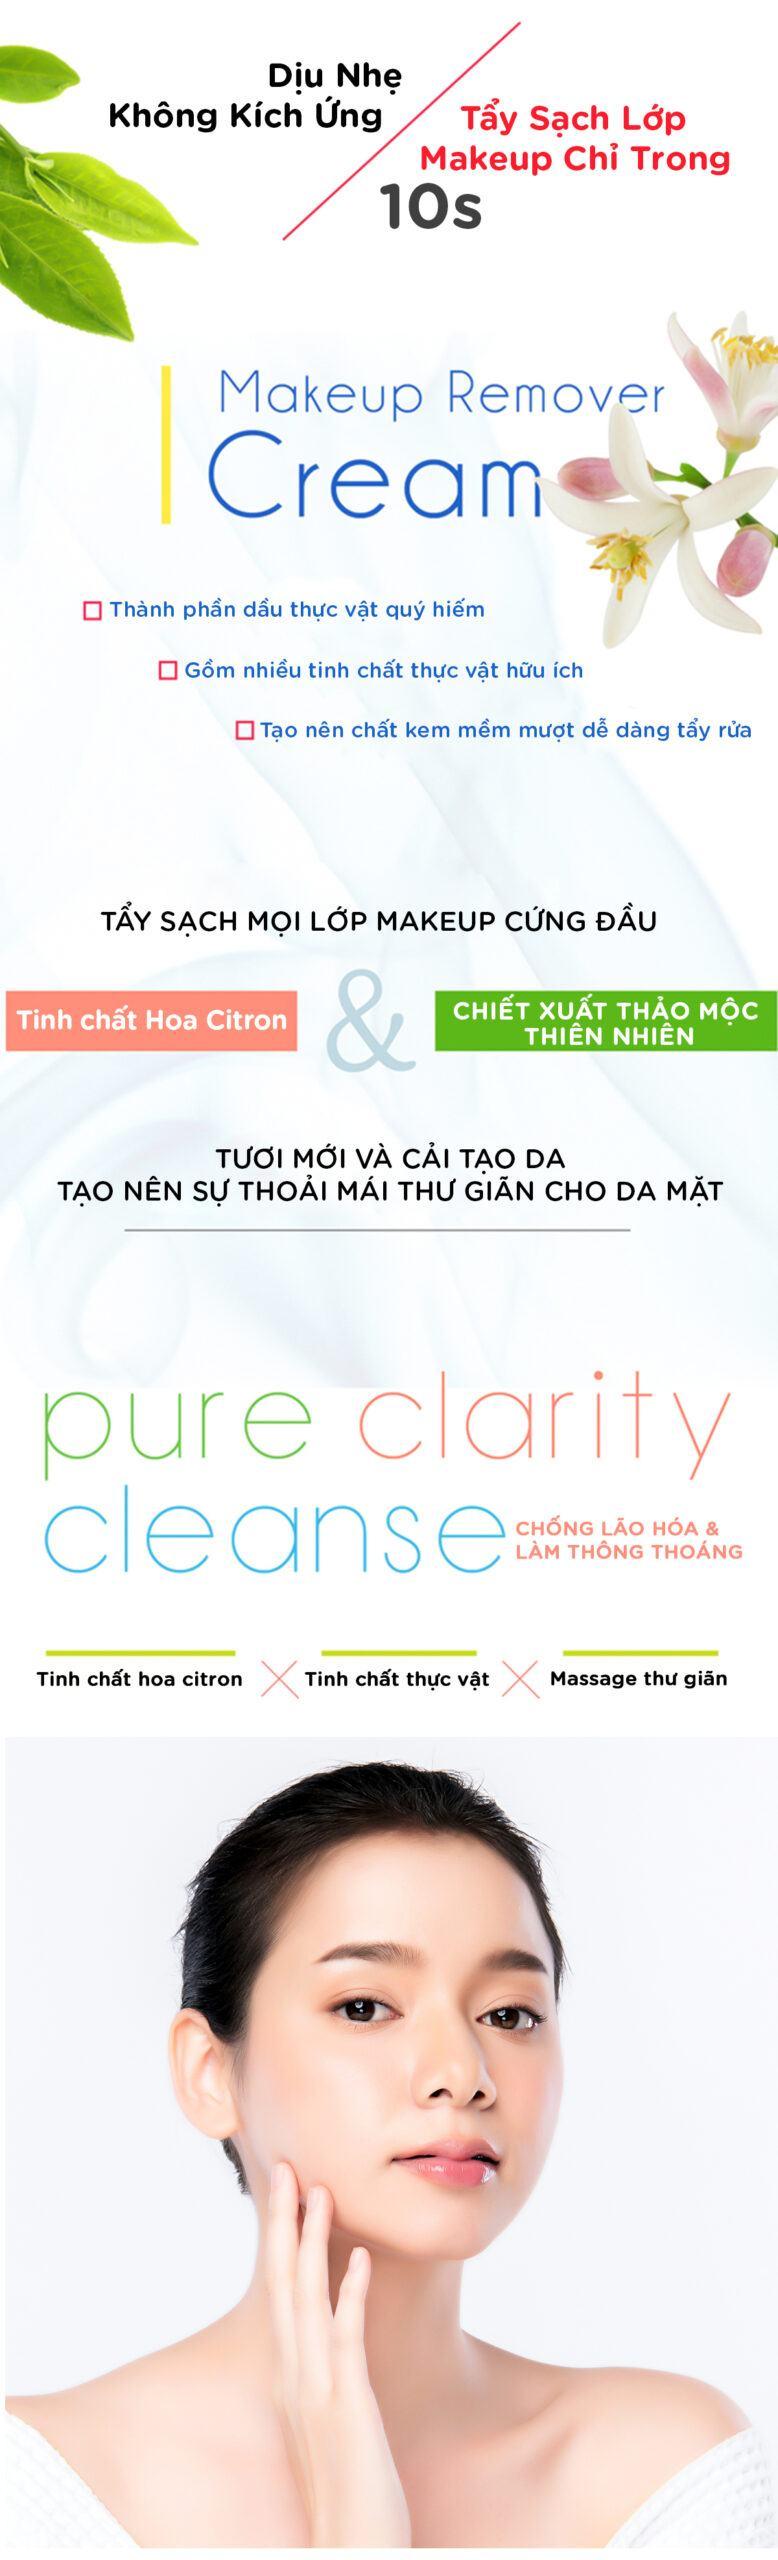 Tác Dụng Của Kem Tẩy Trang Makeup Remover Cream Hoa Citron